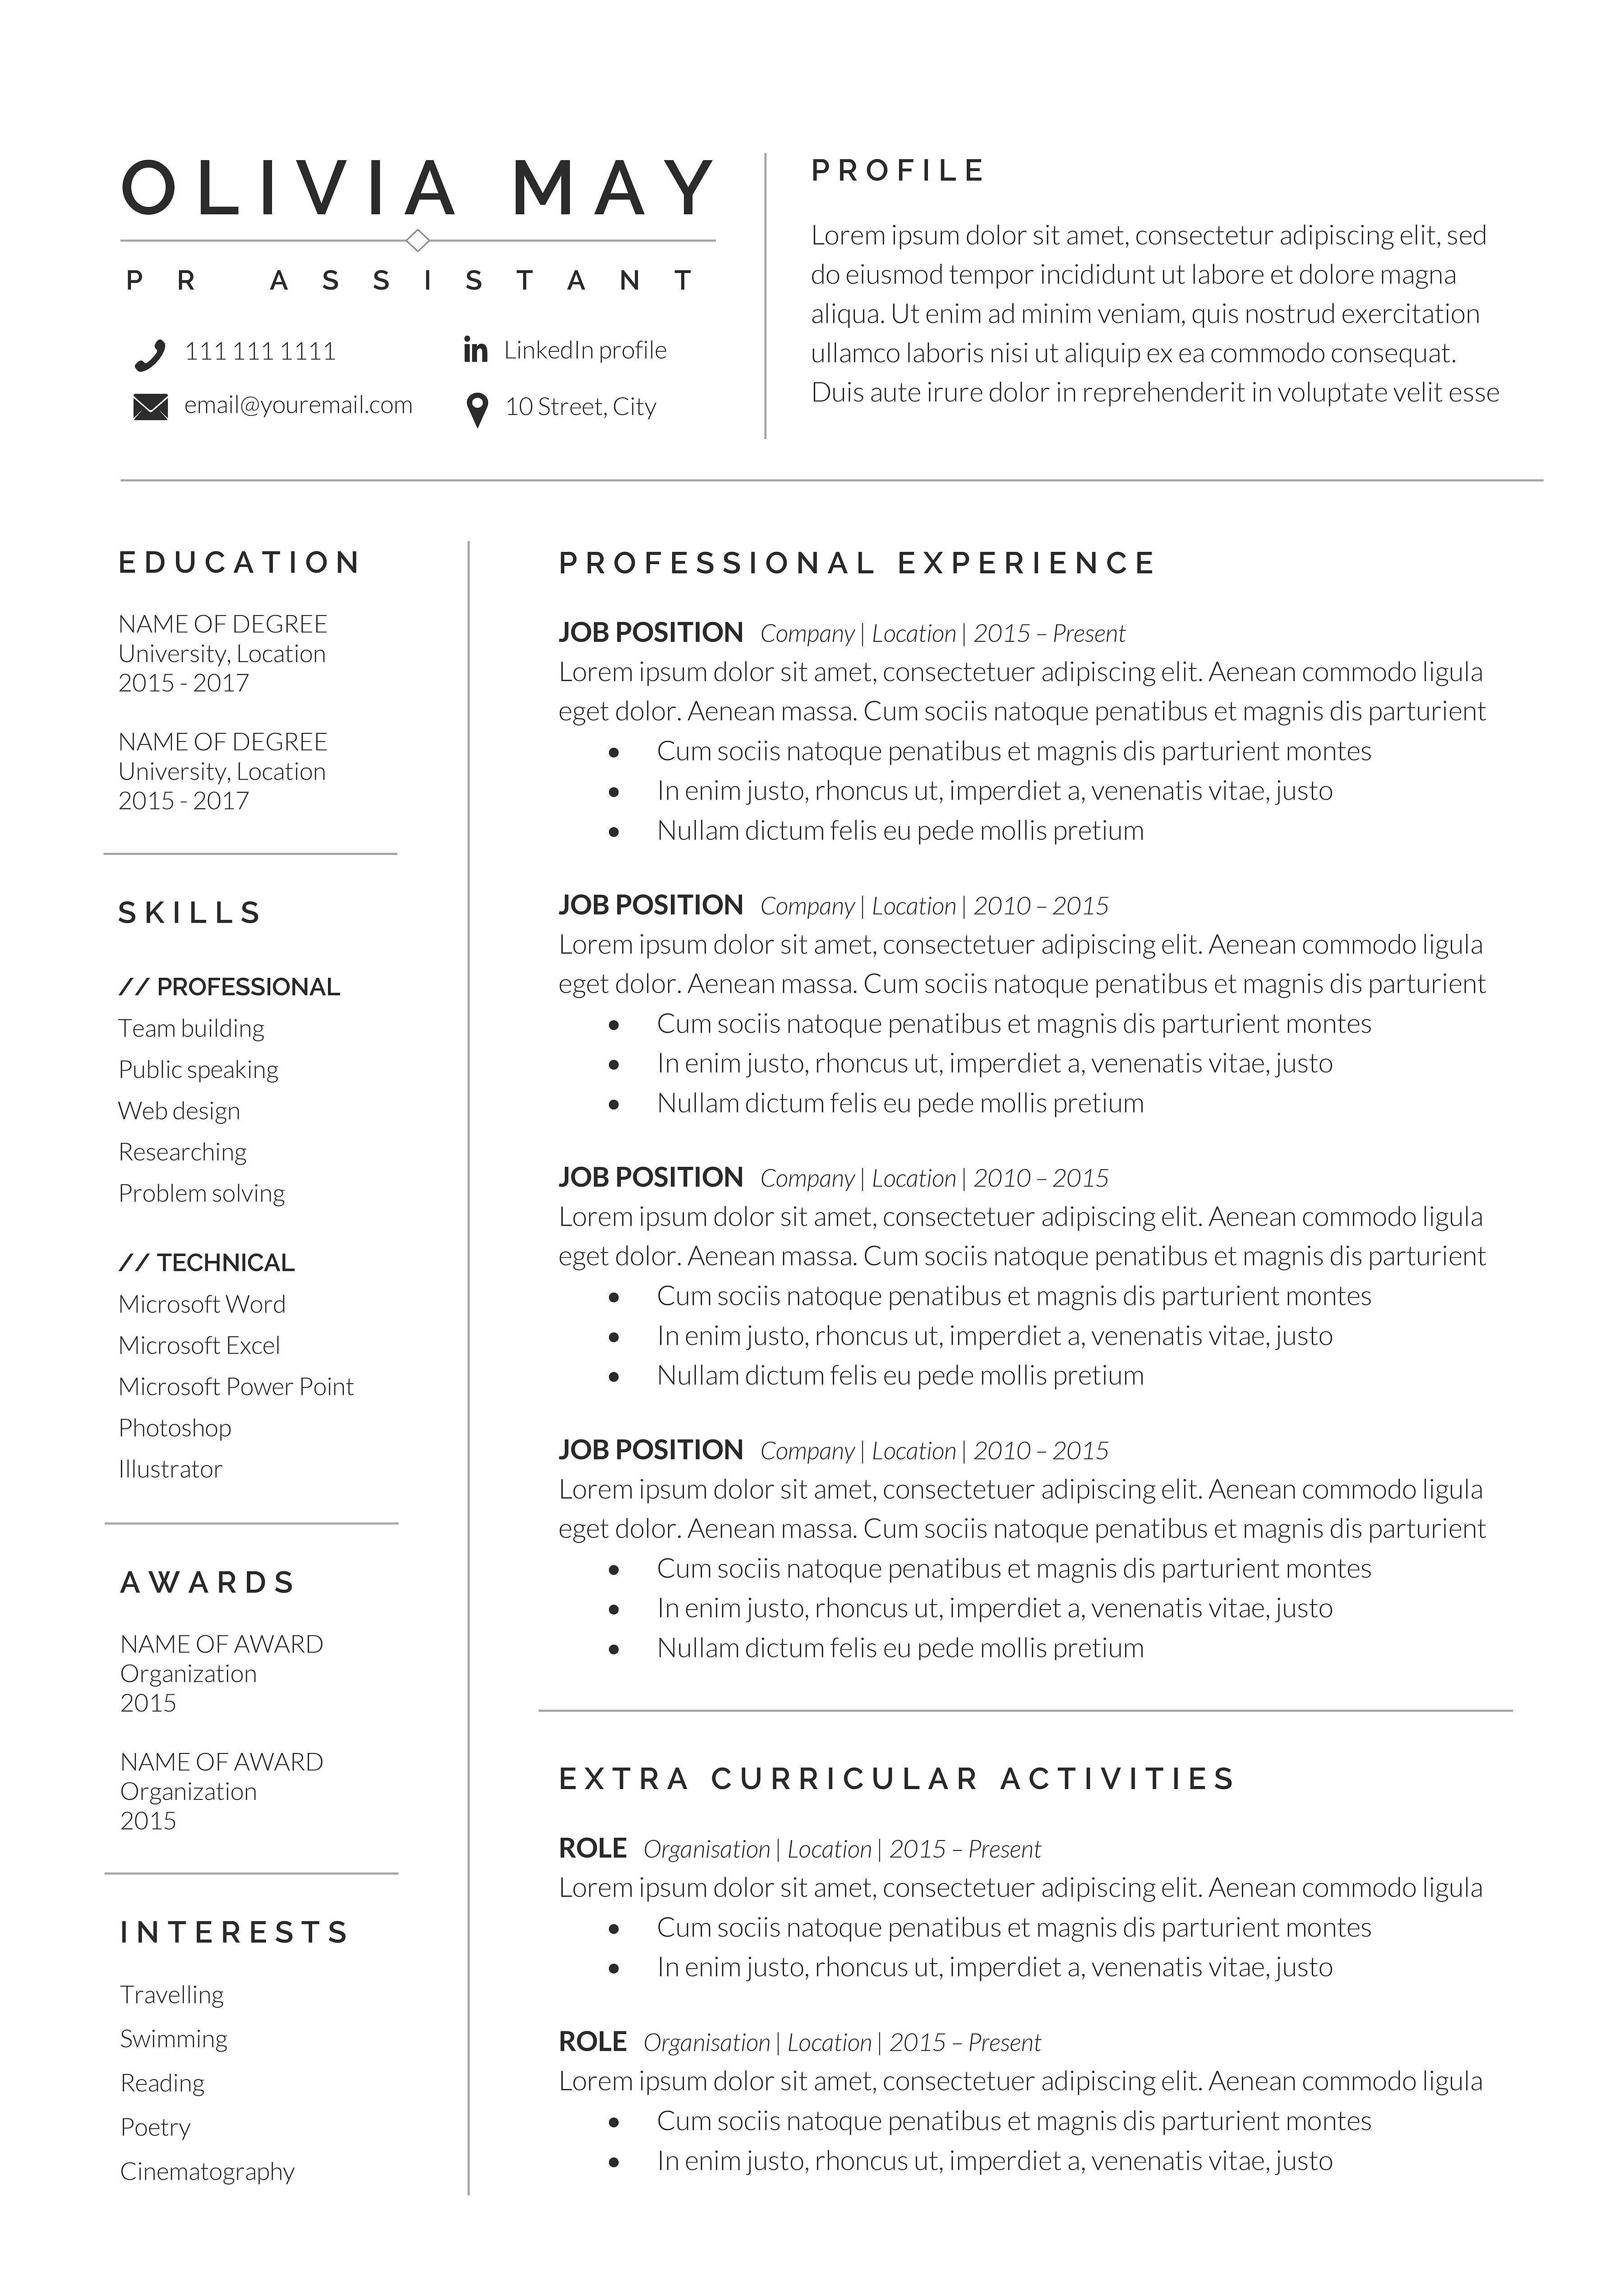 Resume Template Cv Professional Resume Examples Good Resume Examples Resume Examples